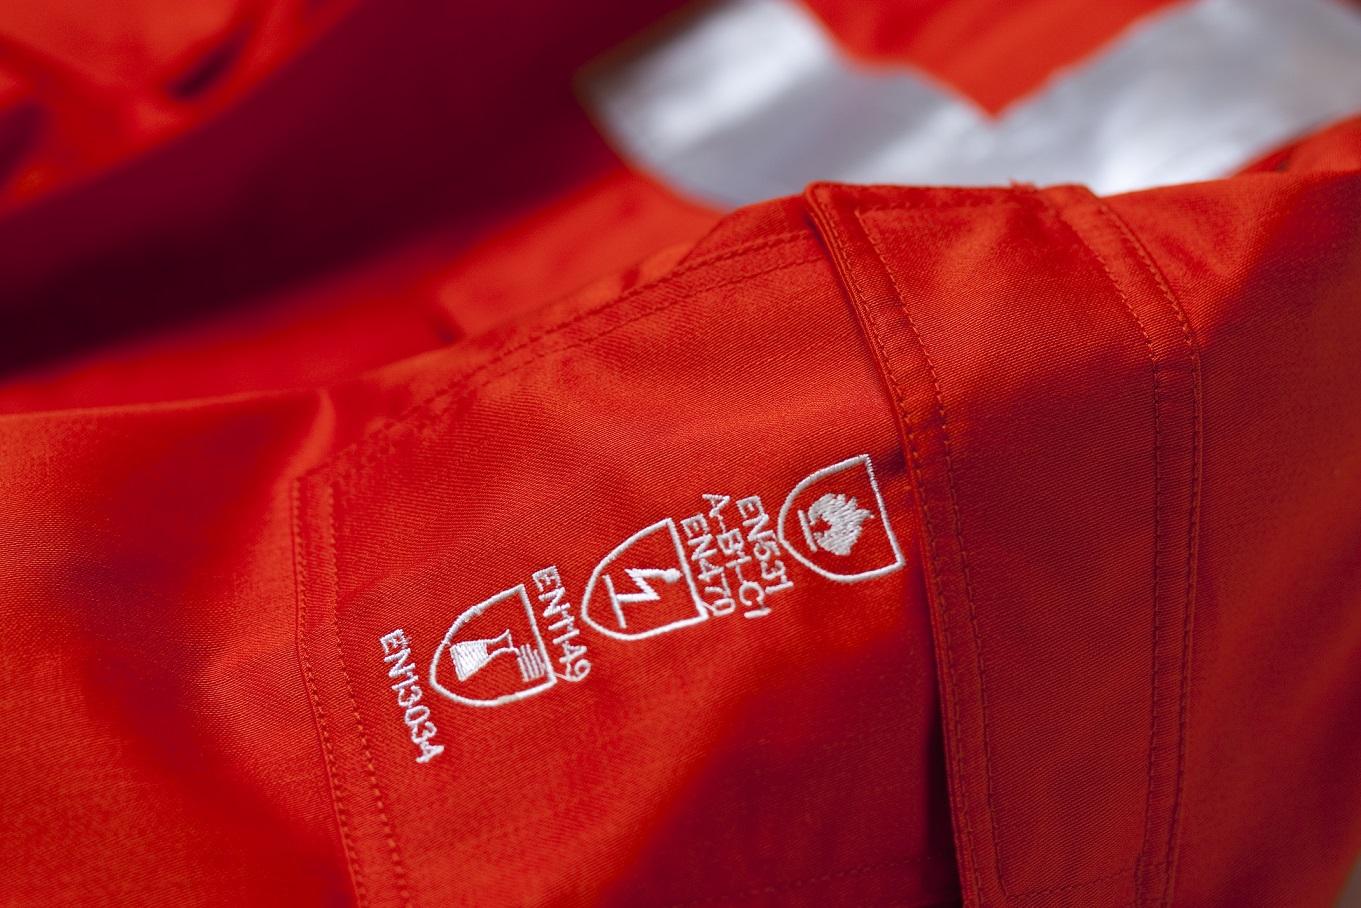 Bedrijfskleding | Streefland Textiles